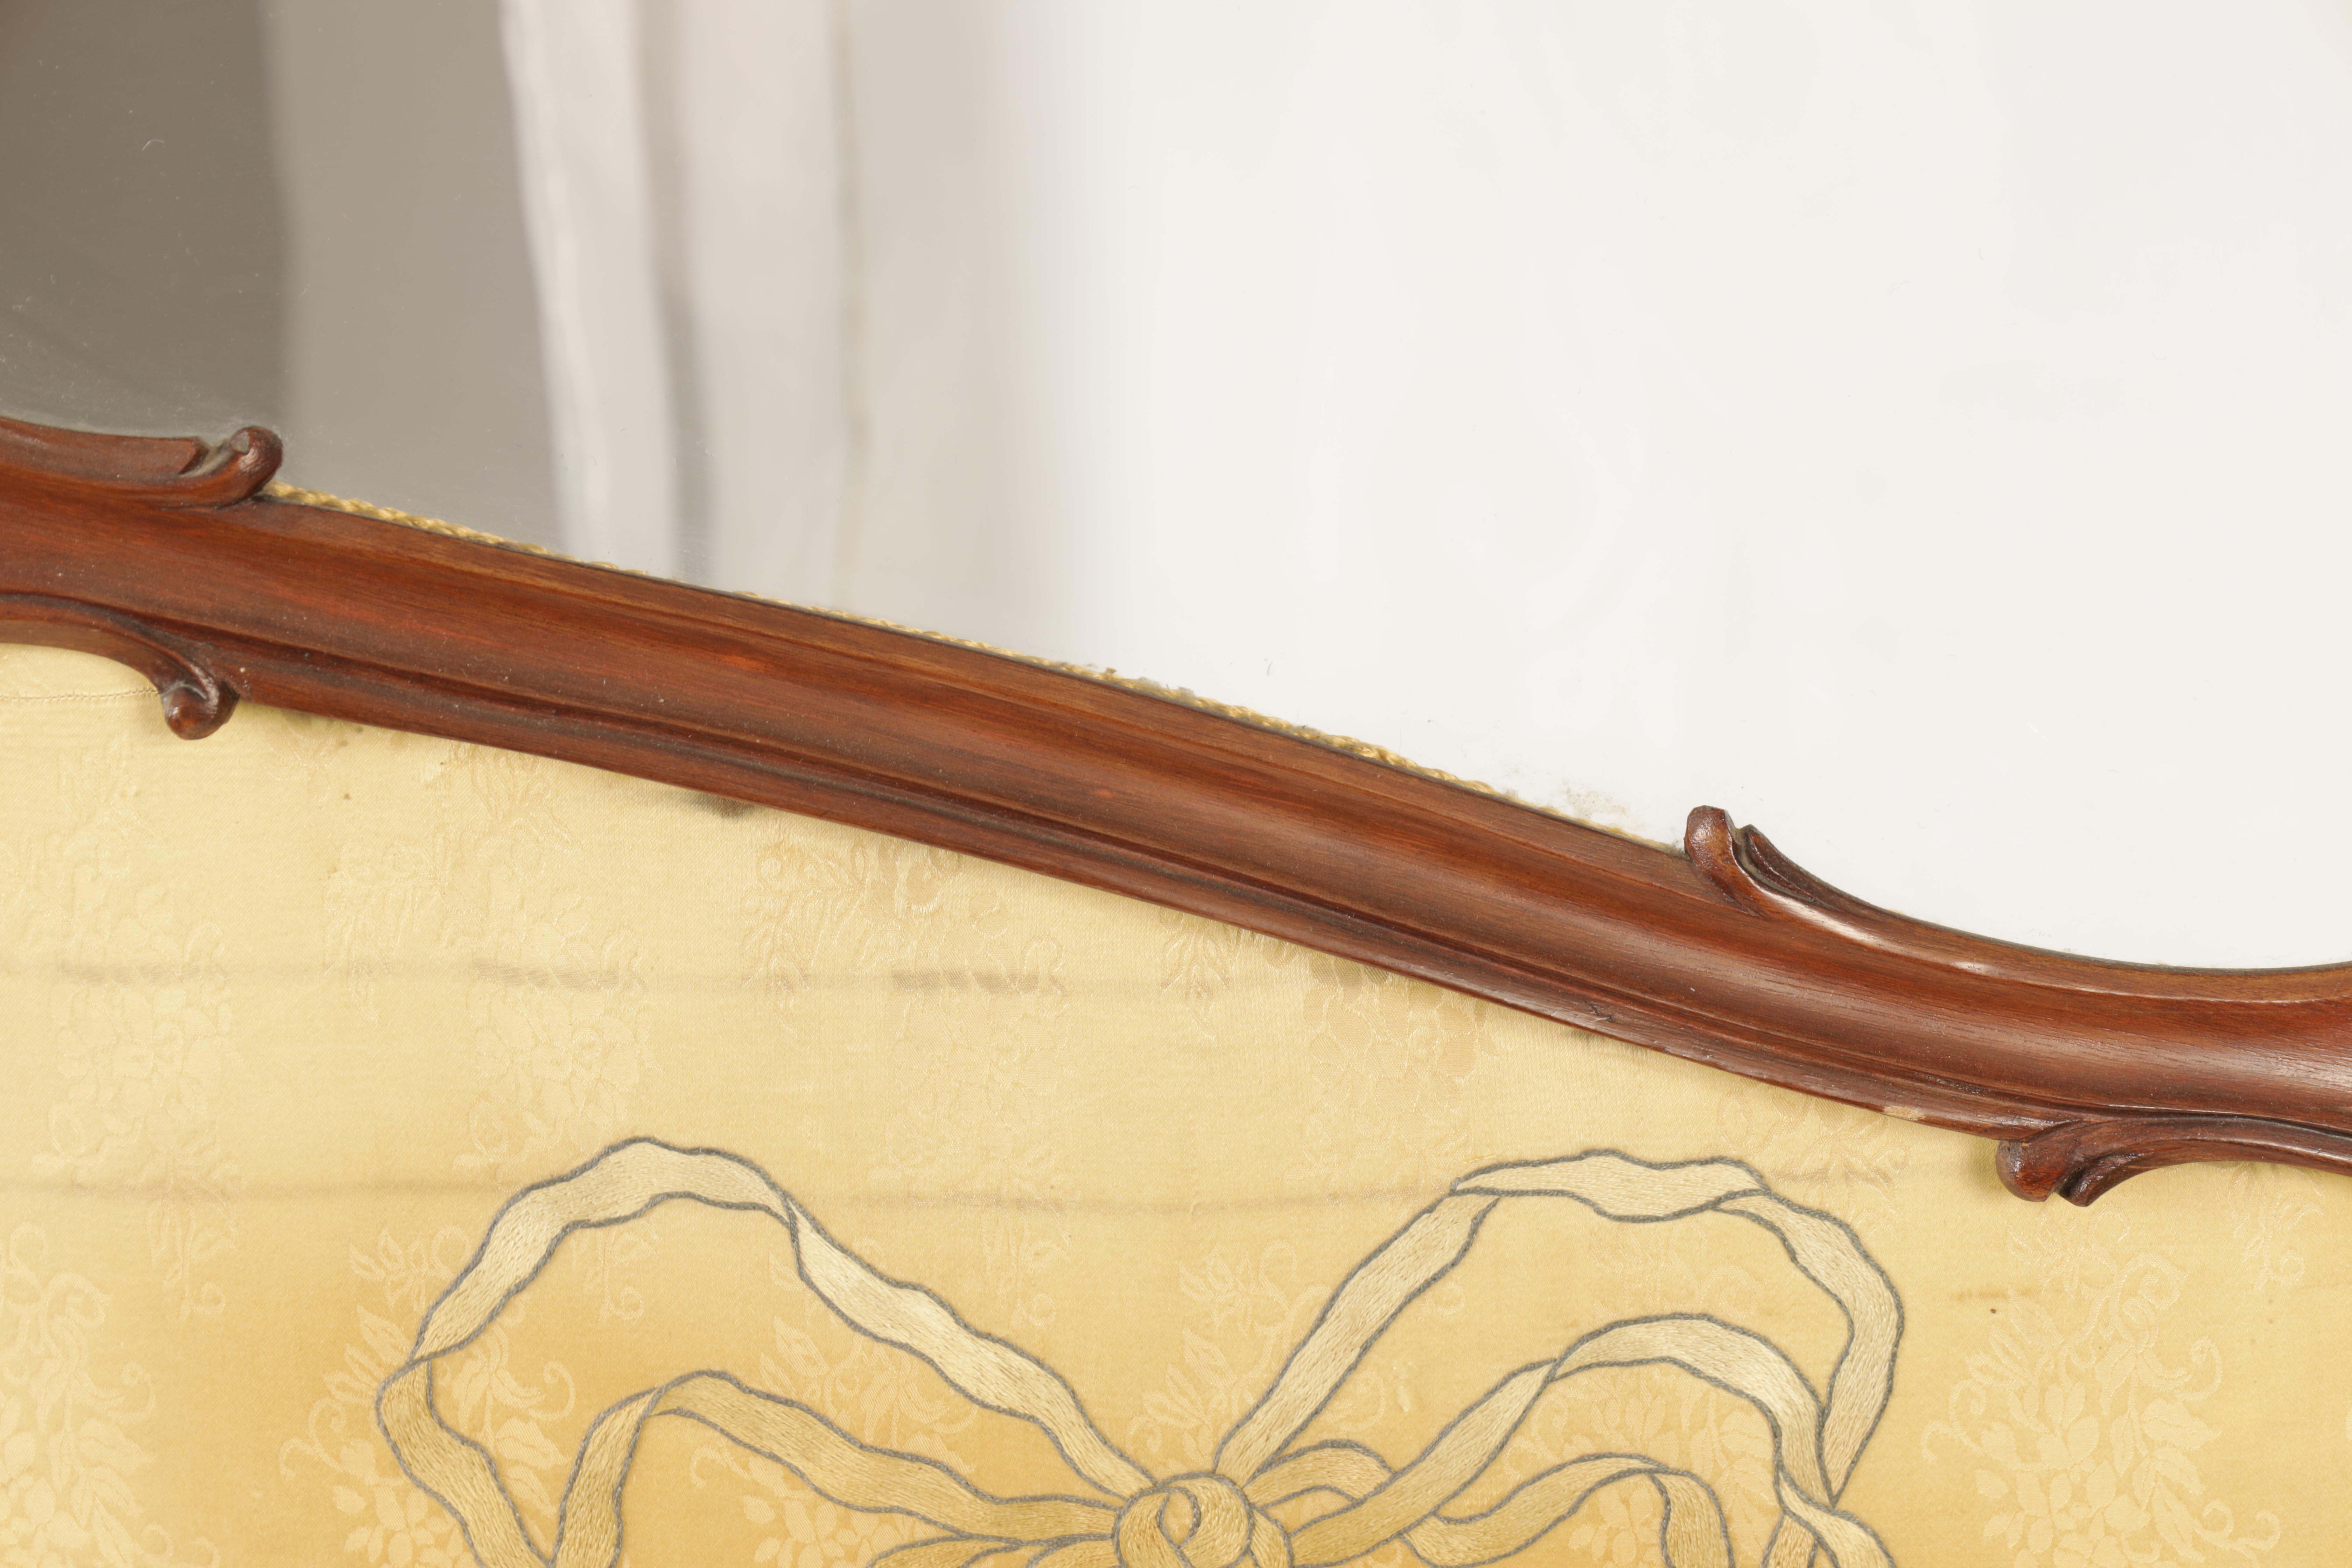 A 19TH CENTURY FRENCH ROCOCO WALNUT FOLDING SCREEN having original silk tapestry panels below - Image 7 of 8